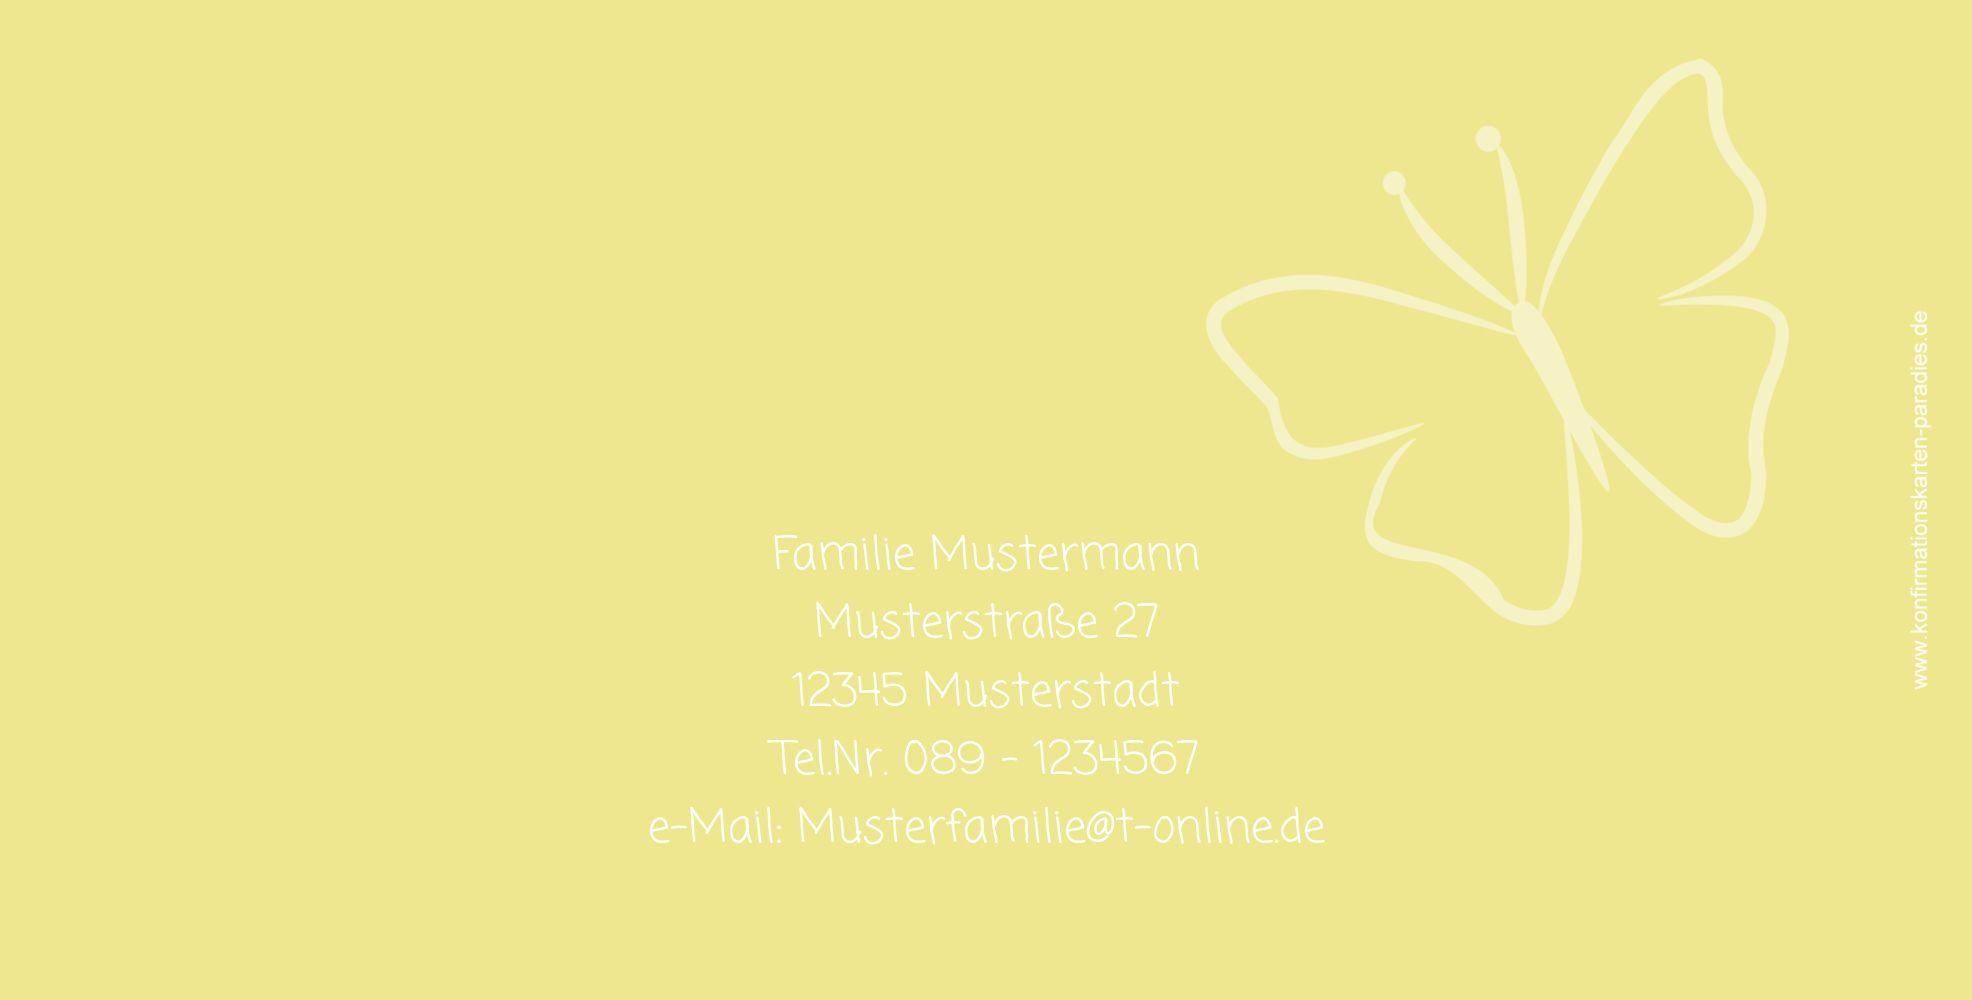 Ansicht 3 - Konfirmation Danke Butterfly 2